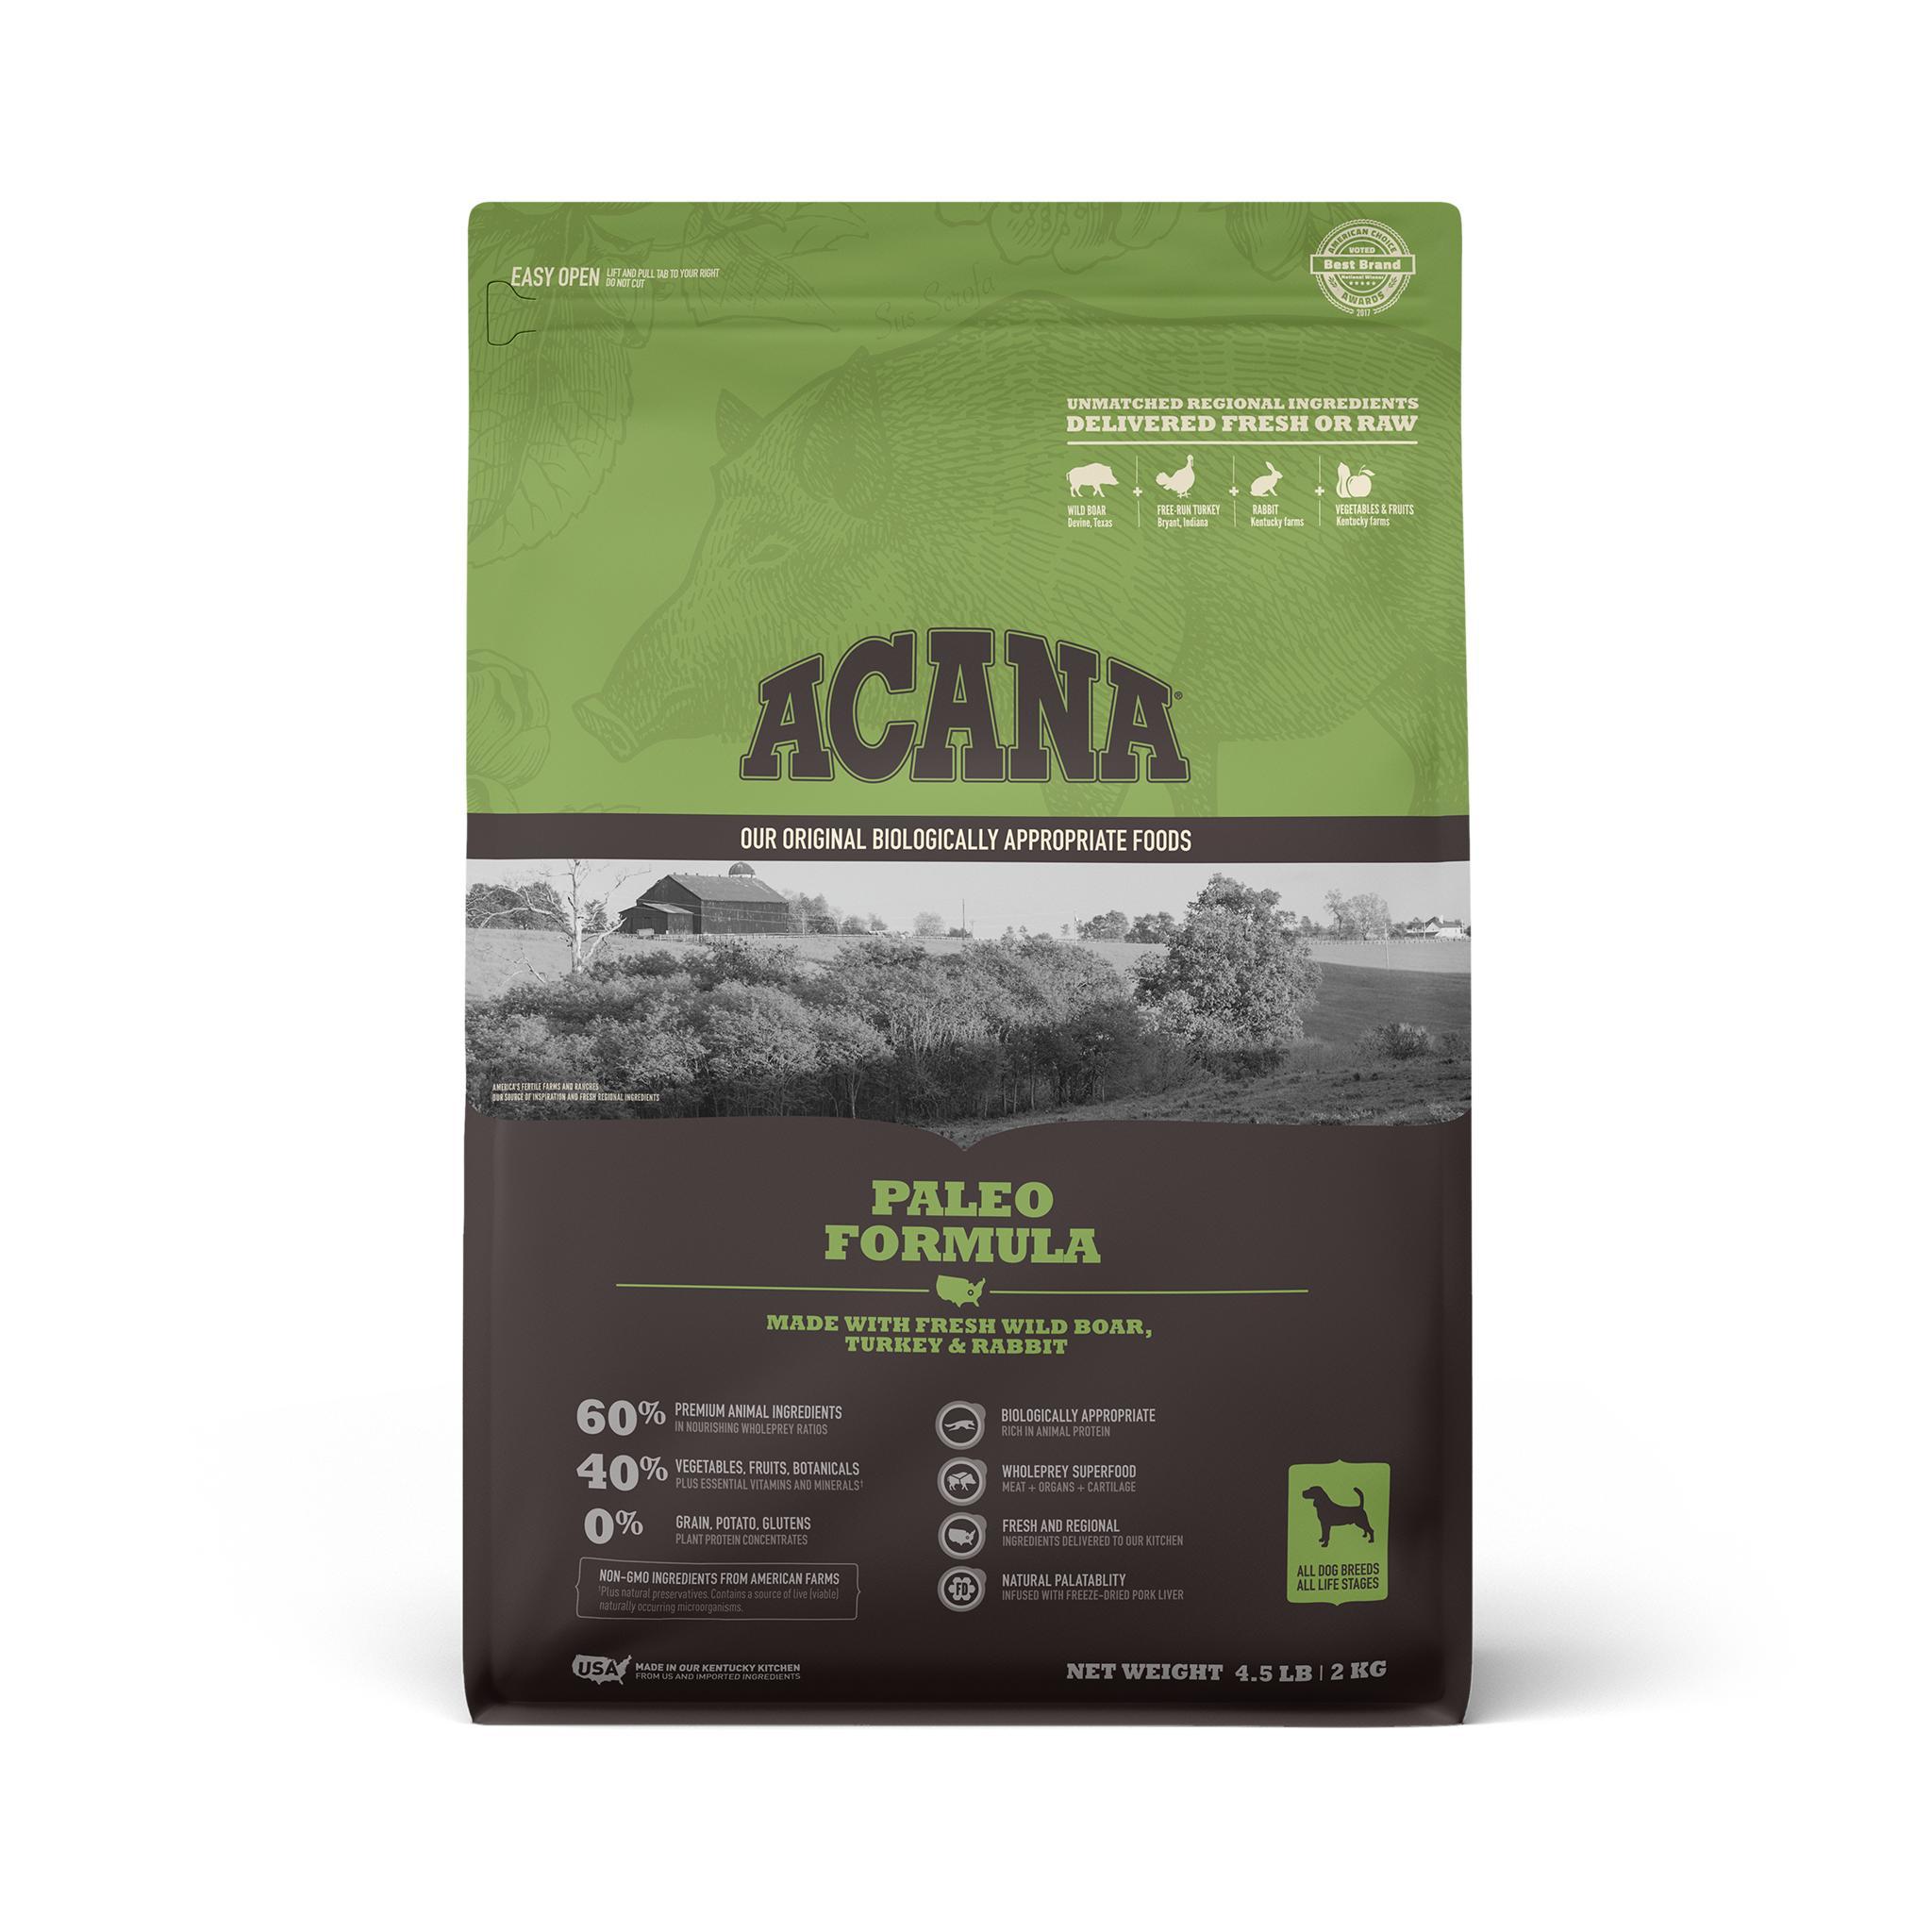 ACANA Paleo Grain-Free Dry Dog Food, 4.5-lb